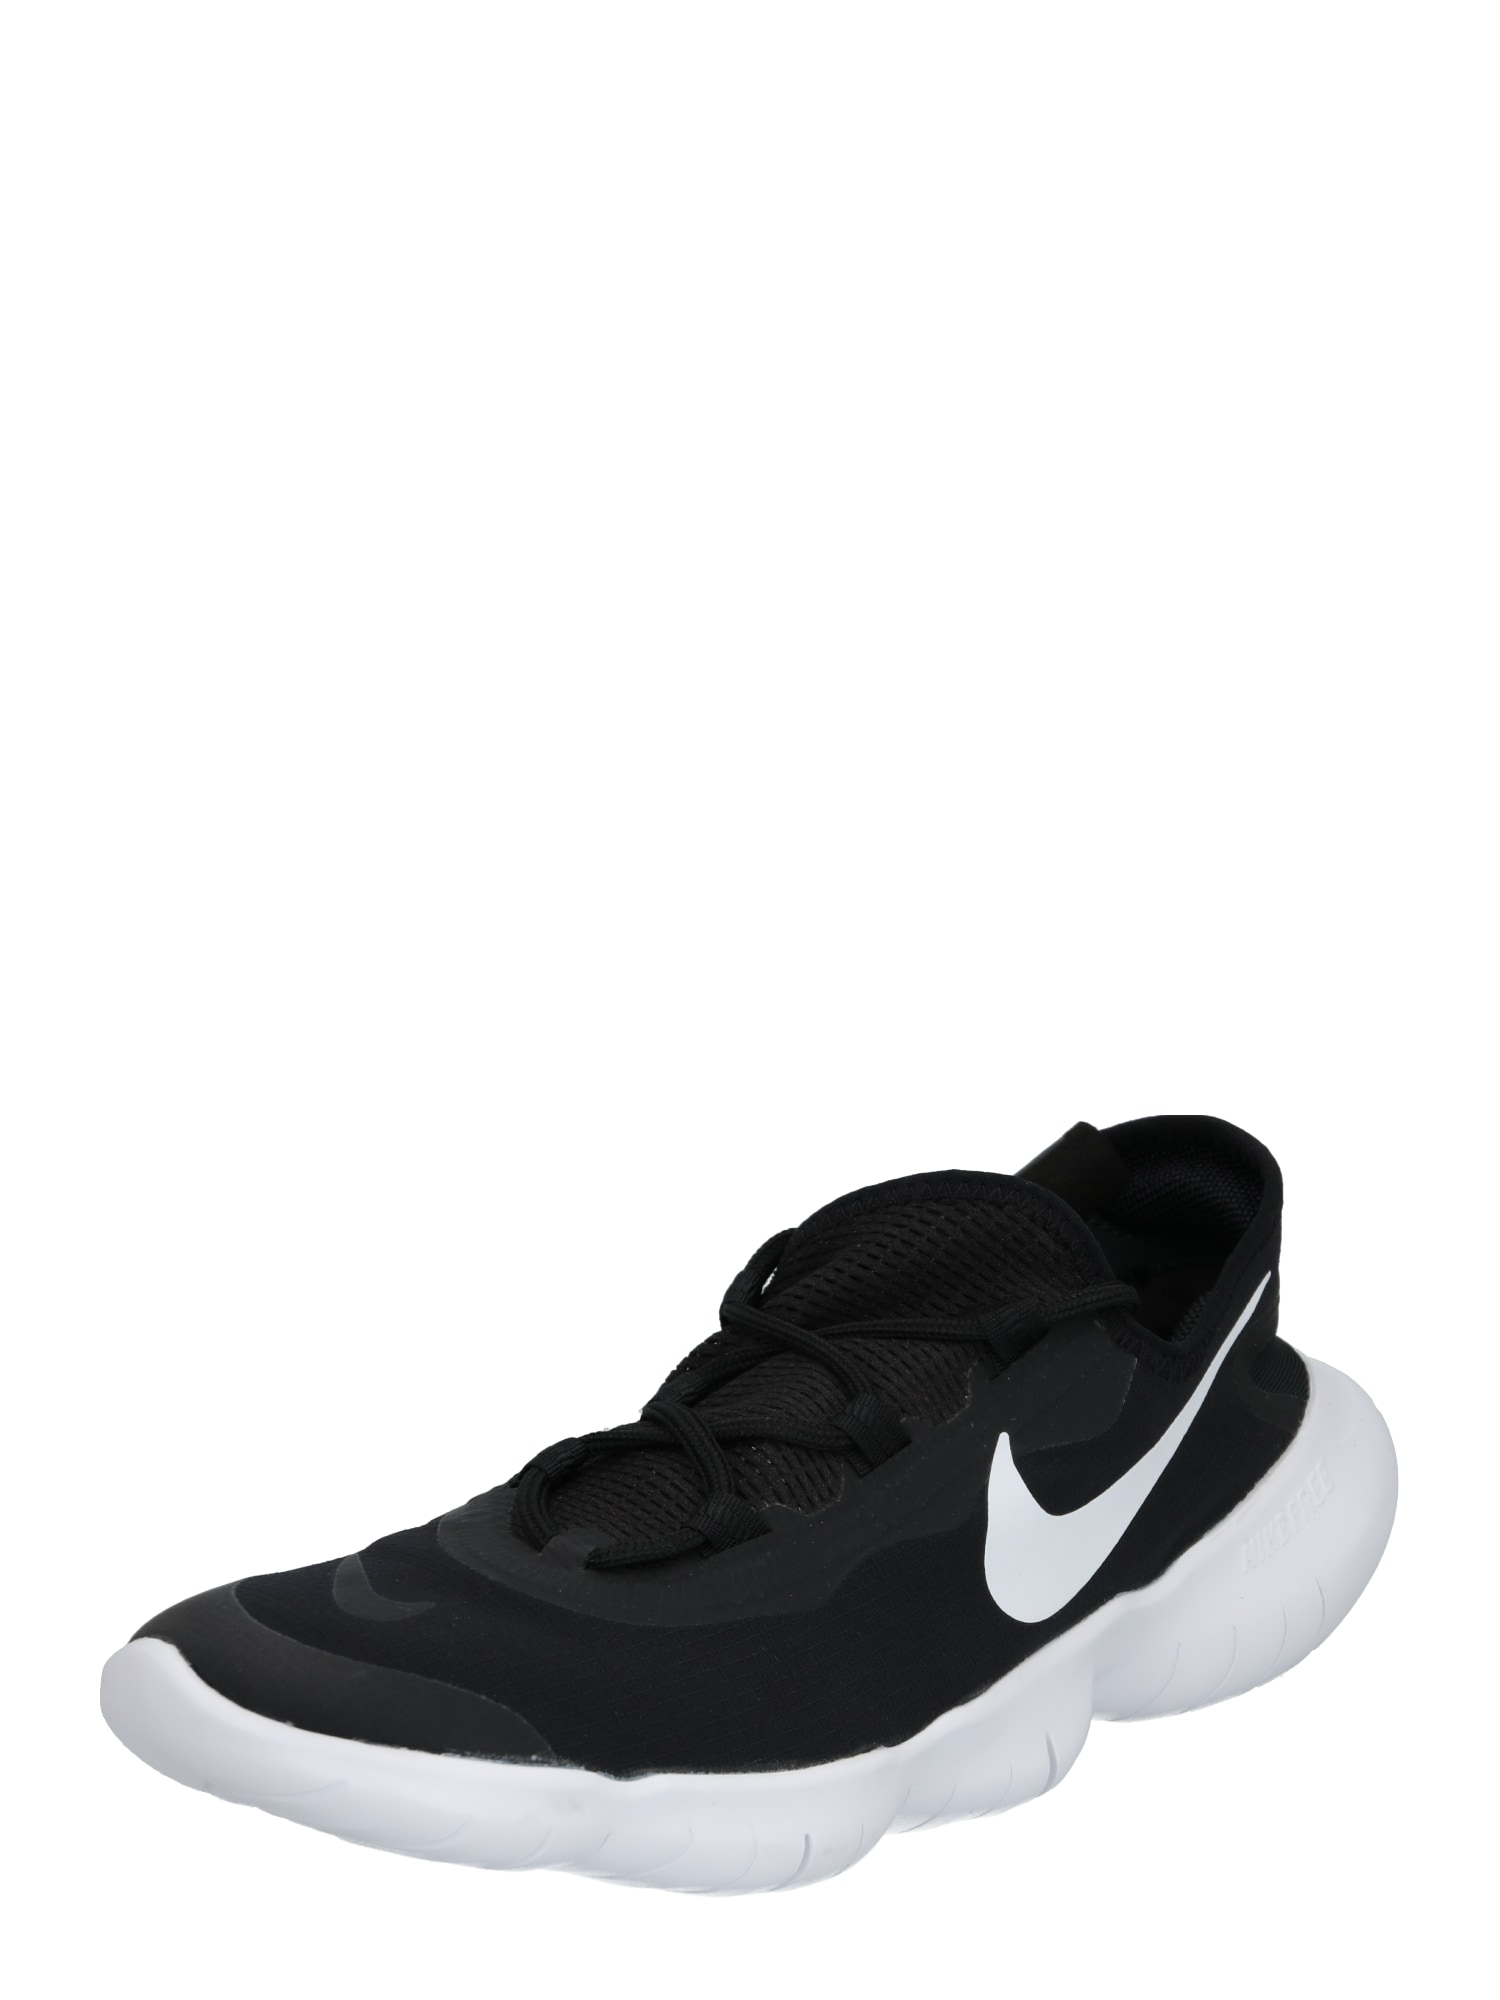 NIKE Bėgimo batai 'Free Run 5.0' balta / juoda